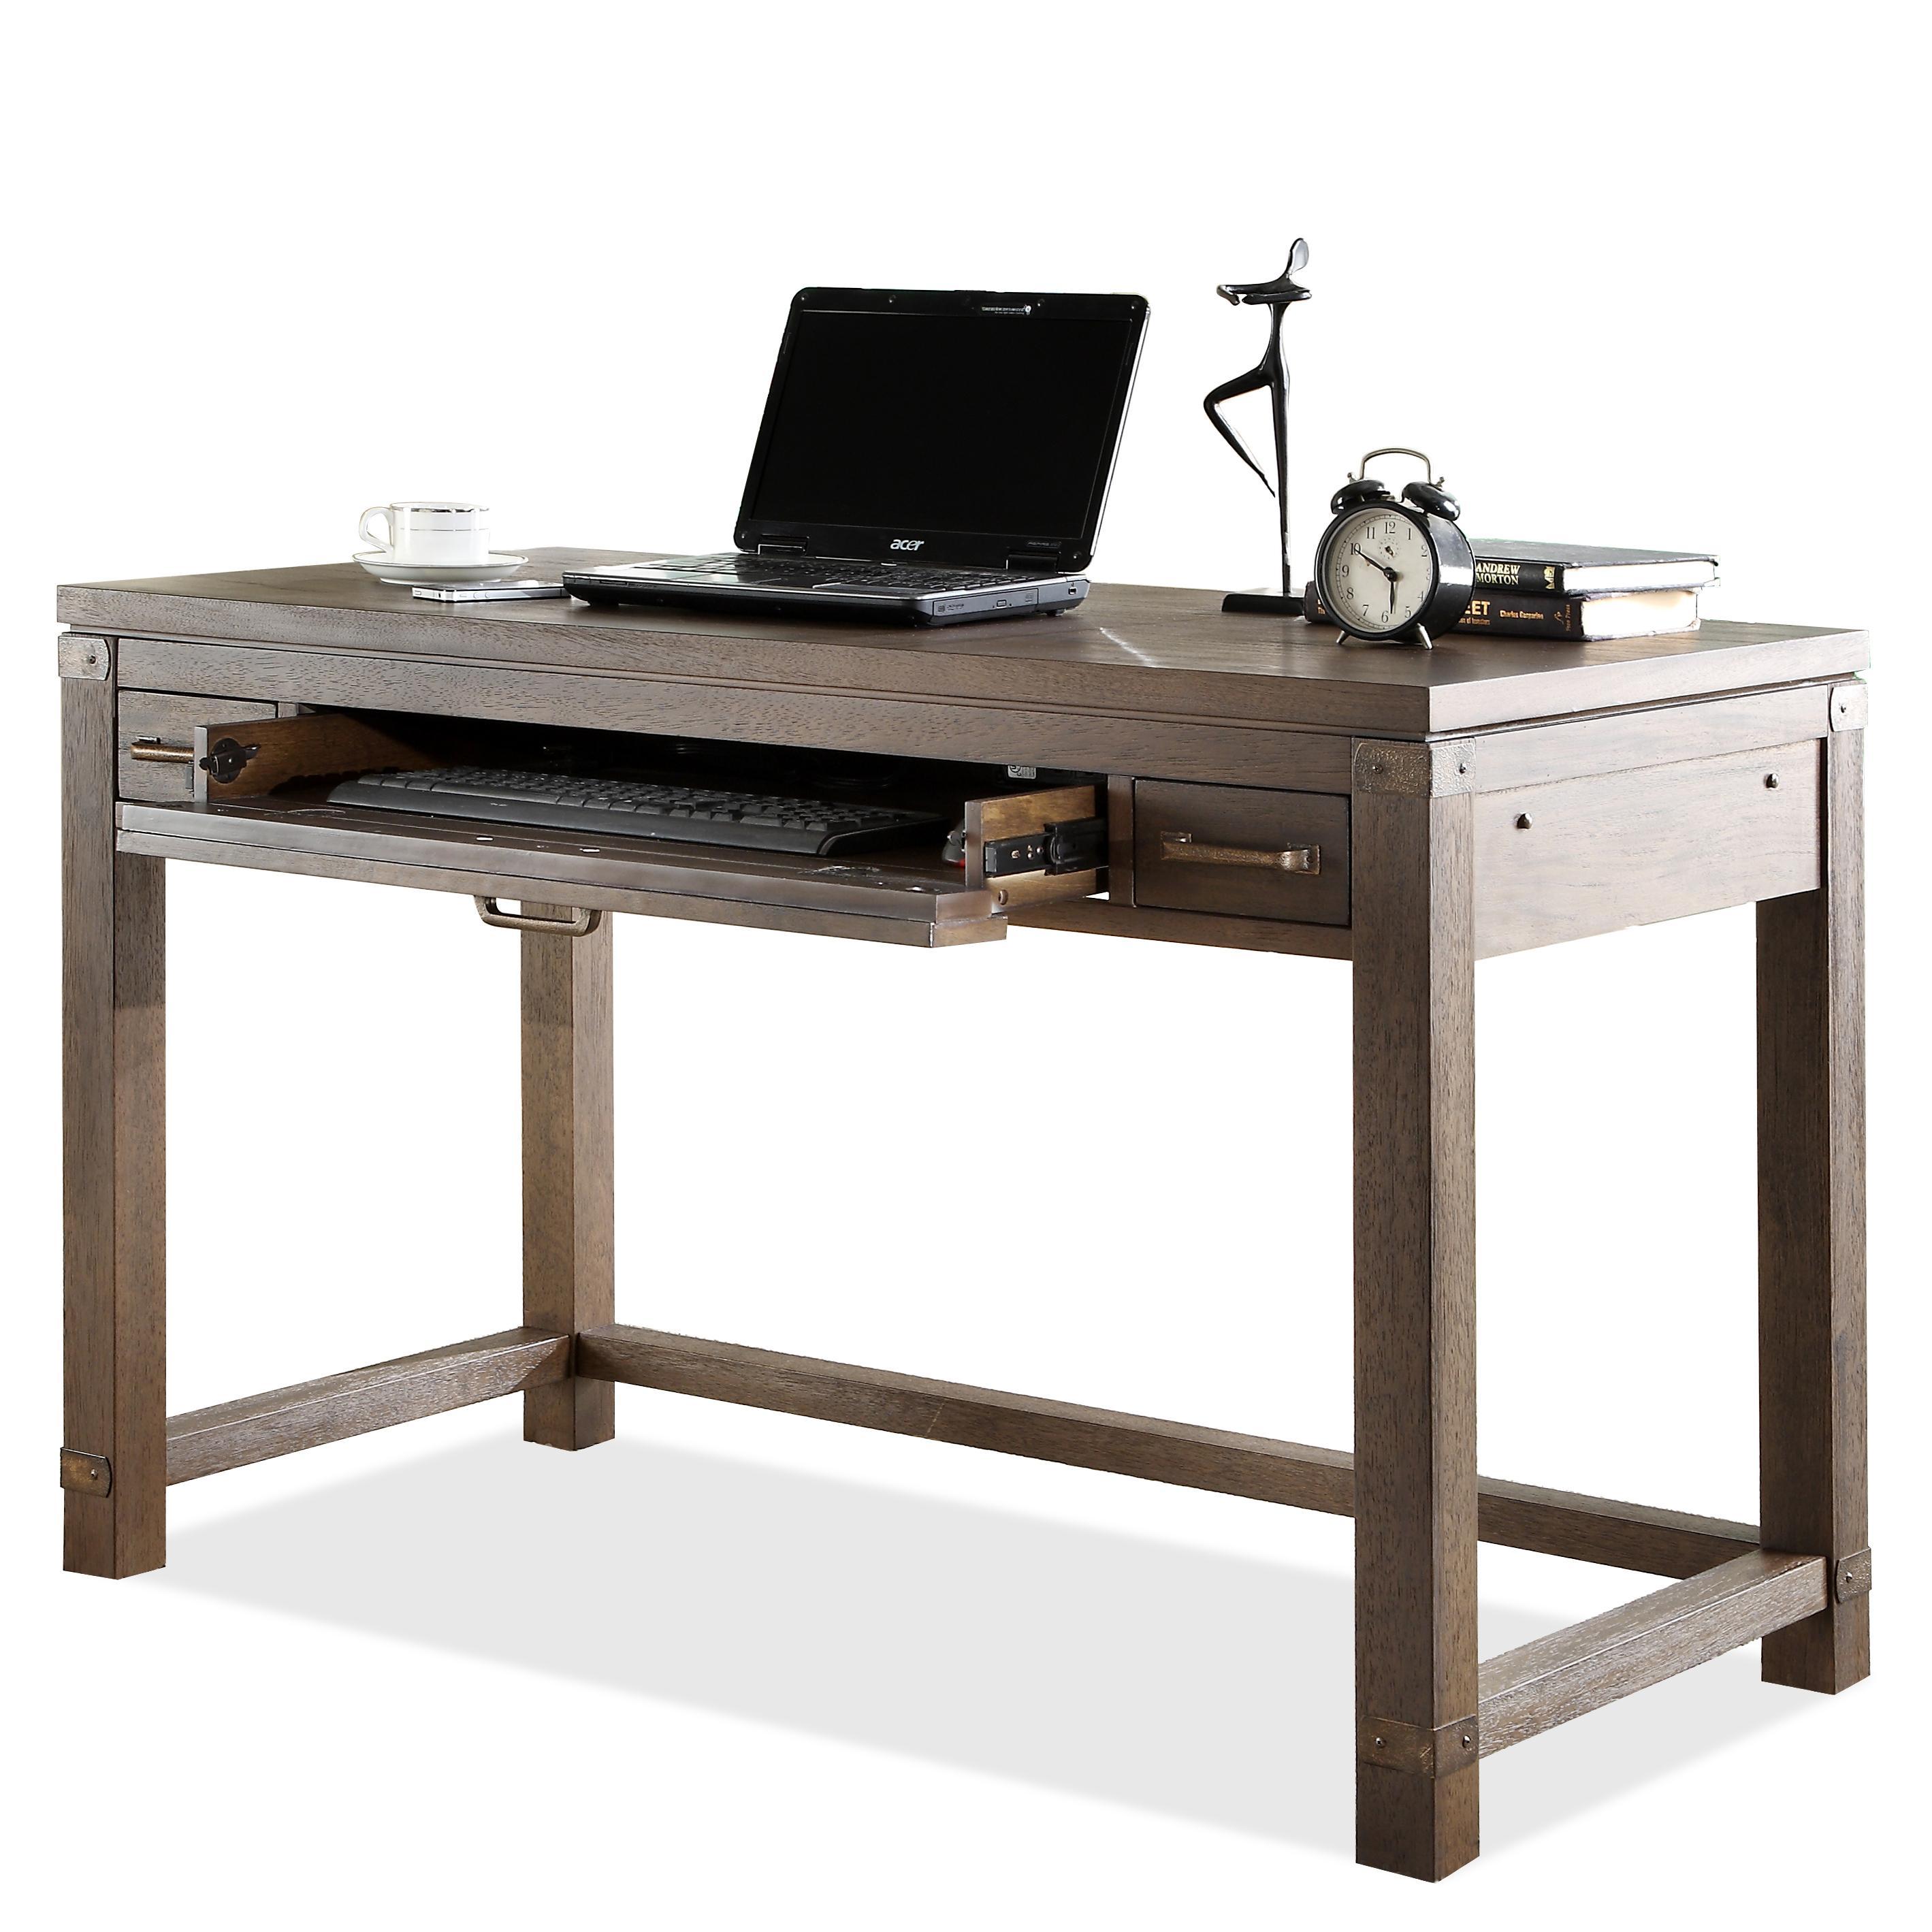 riverside furniture promenade 84532 writing desk with pull out drawer dunk bright furniture. Black Bedroom Furniture Sets. Home Design Ideas